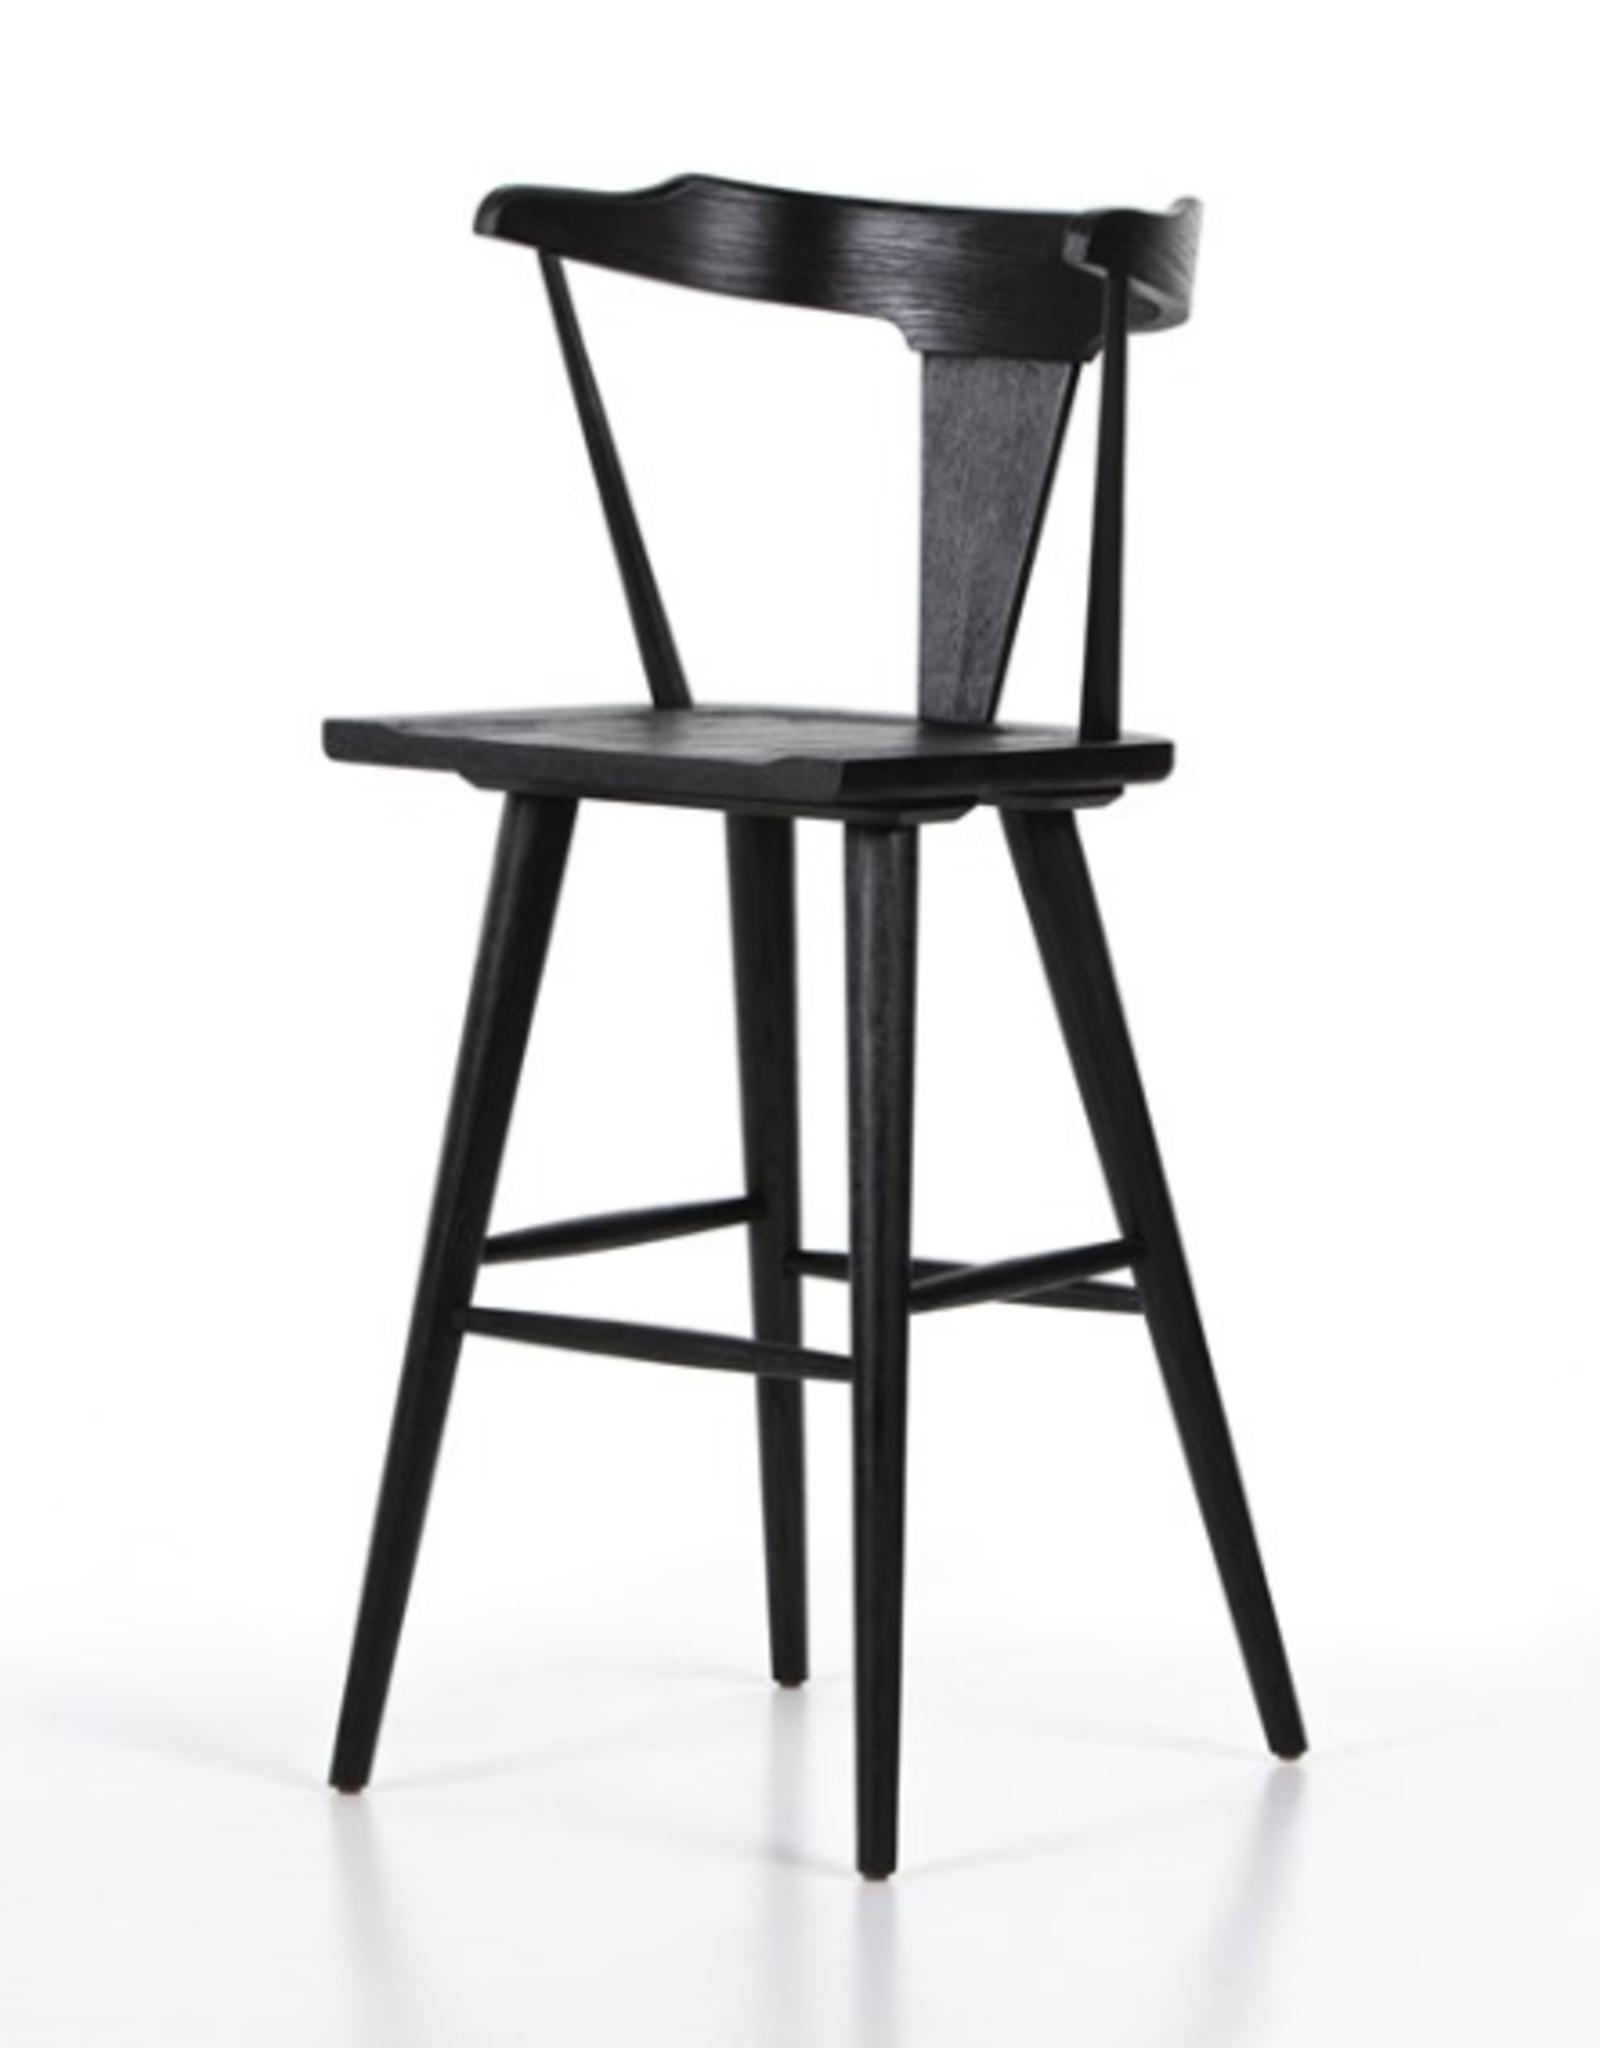 STOOL RIPLEY BLACK OAK COUNTER HEIGHT